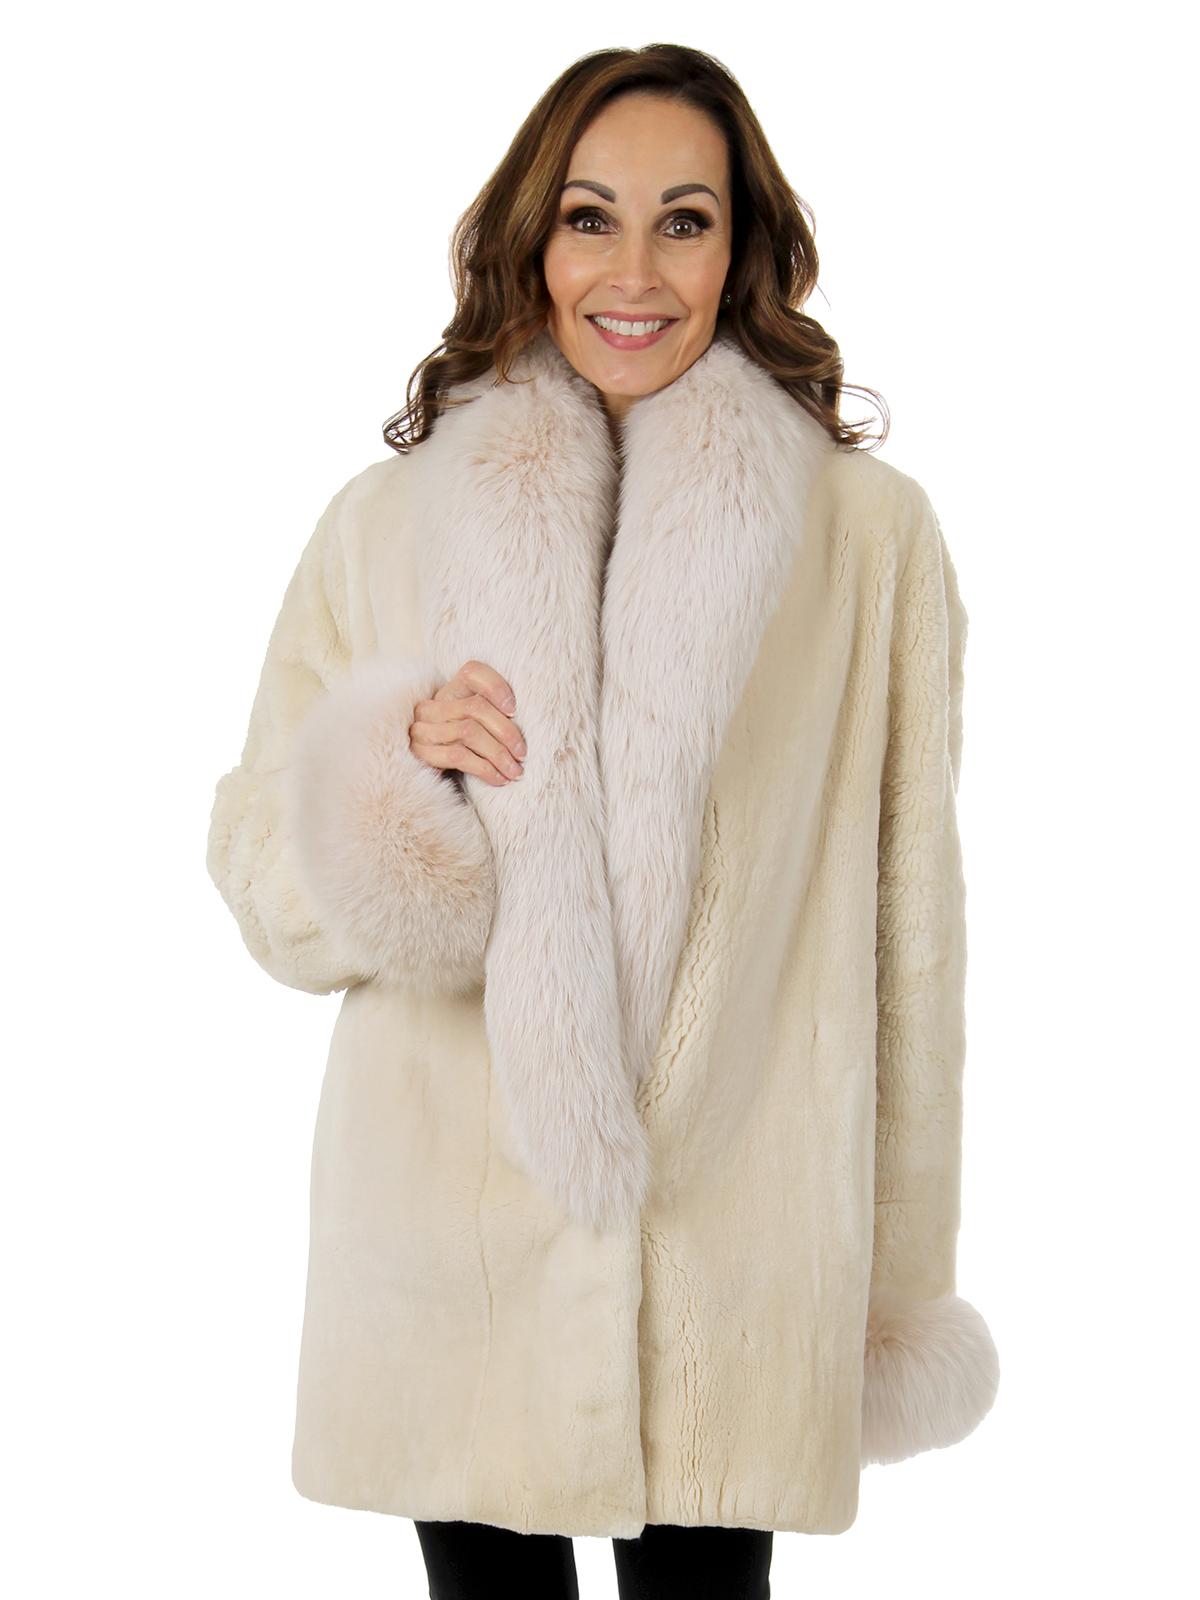 Louis Feraud Woman's Cream Sheared Beaver Fur Jacket With Fox Collar And Cuffs